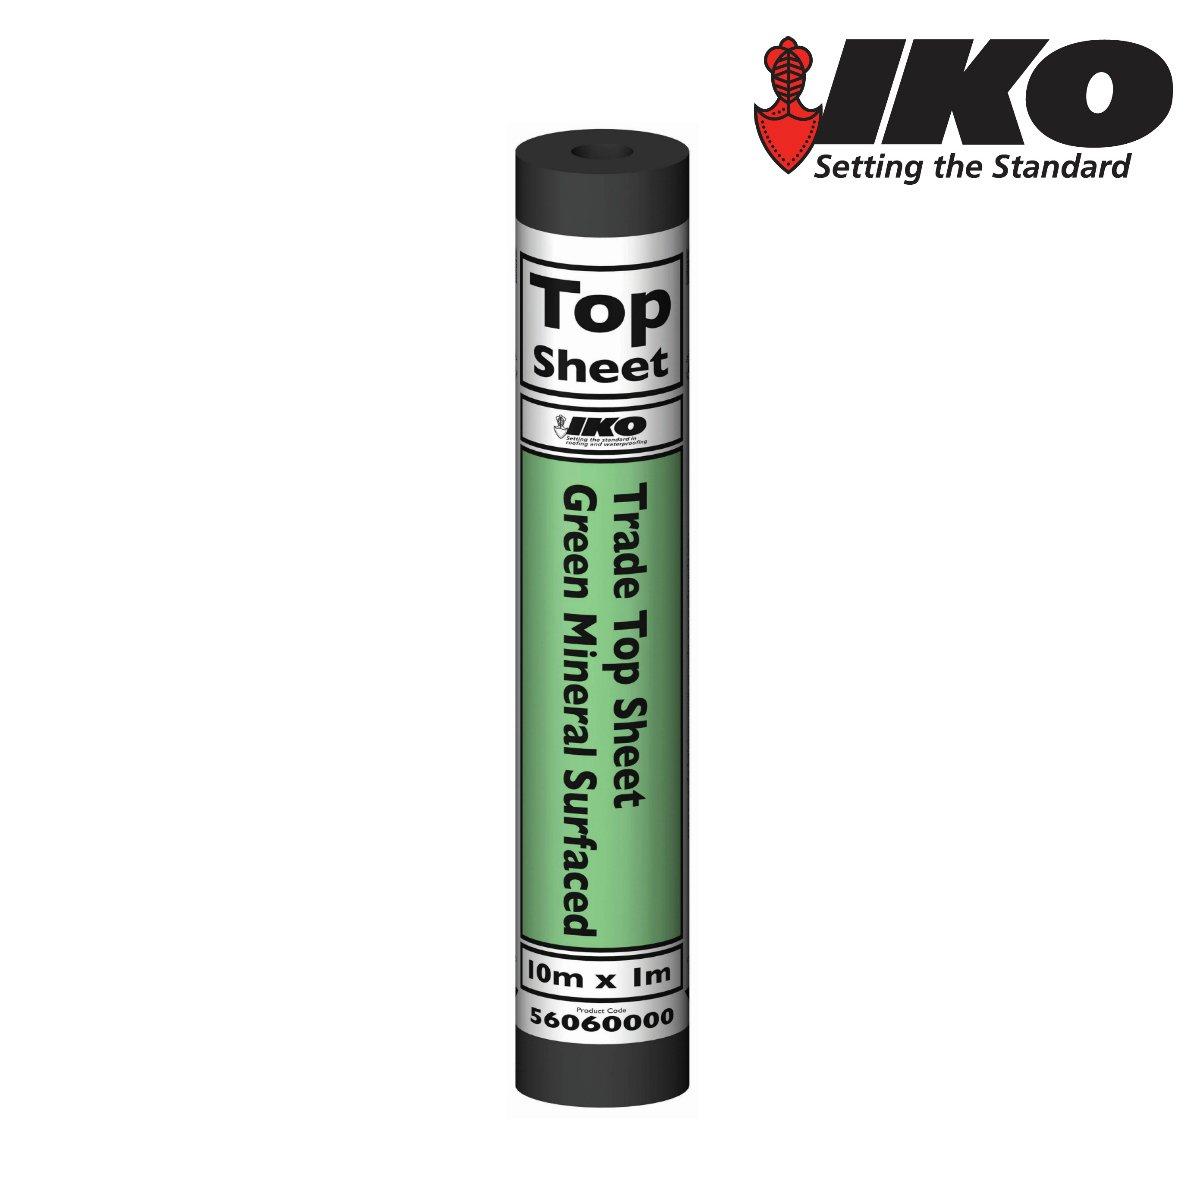 IKO Trade Top Sheet   Green 10m x 1m   Garden Roofing Shed Felt Bitumen Roof